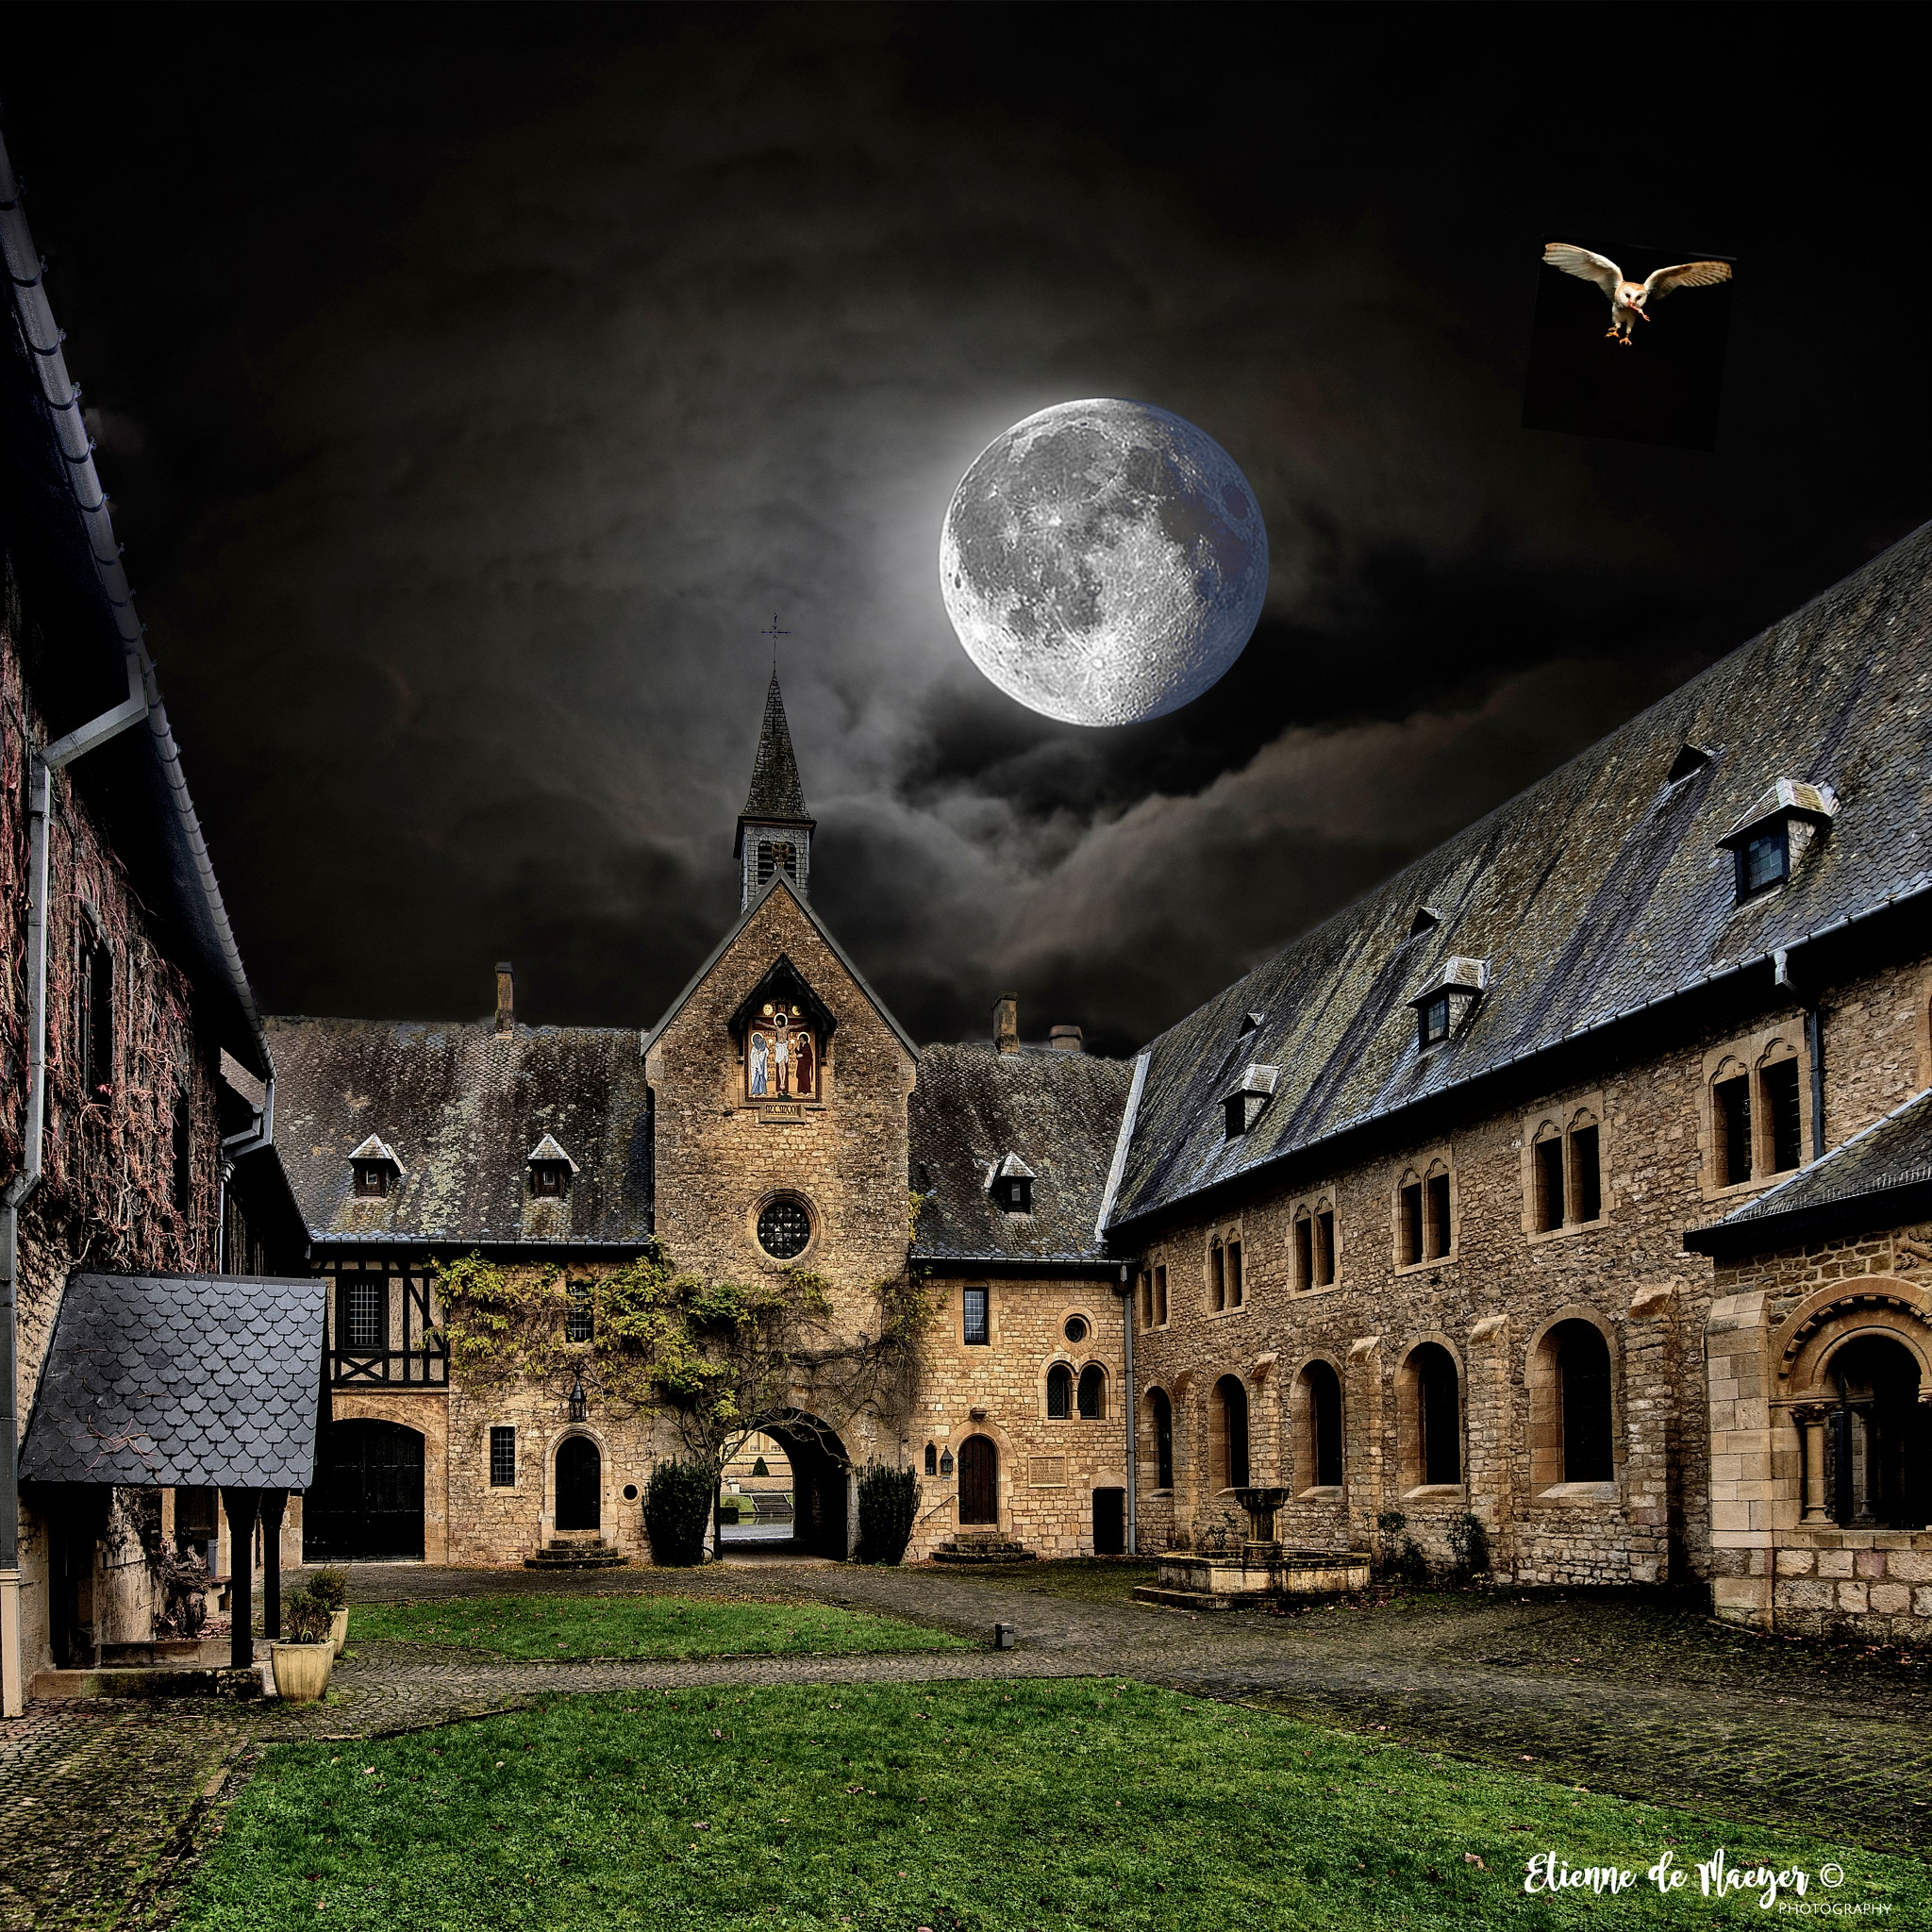 Orval under a shining moon by Etienne de Maeyer